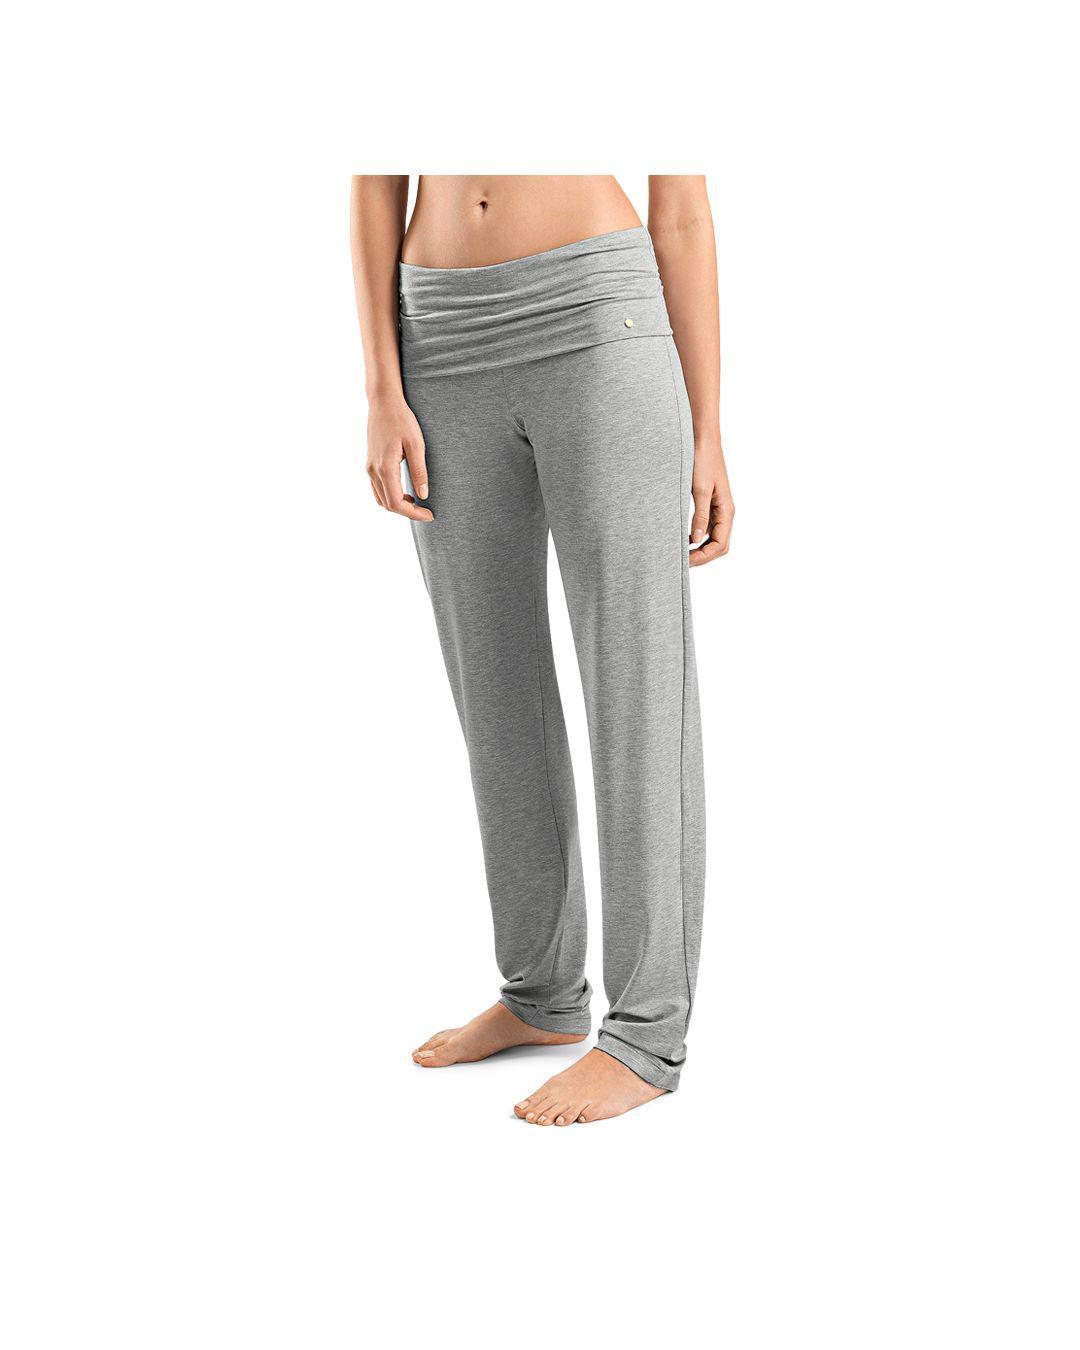 b1d0b82312e24 Hanro. Women's Gray Yoga Lounge Trousers